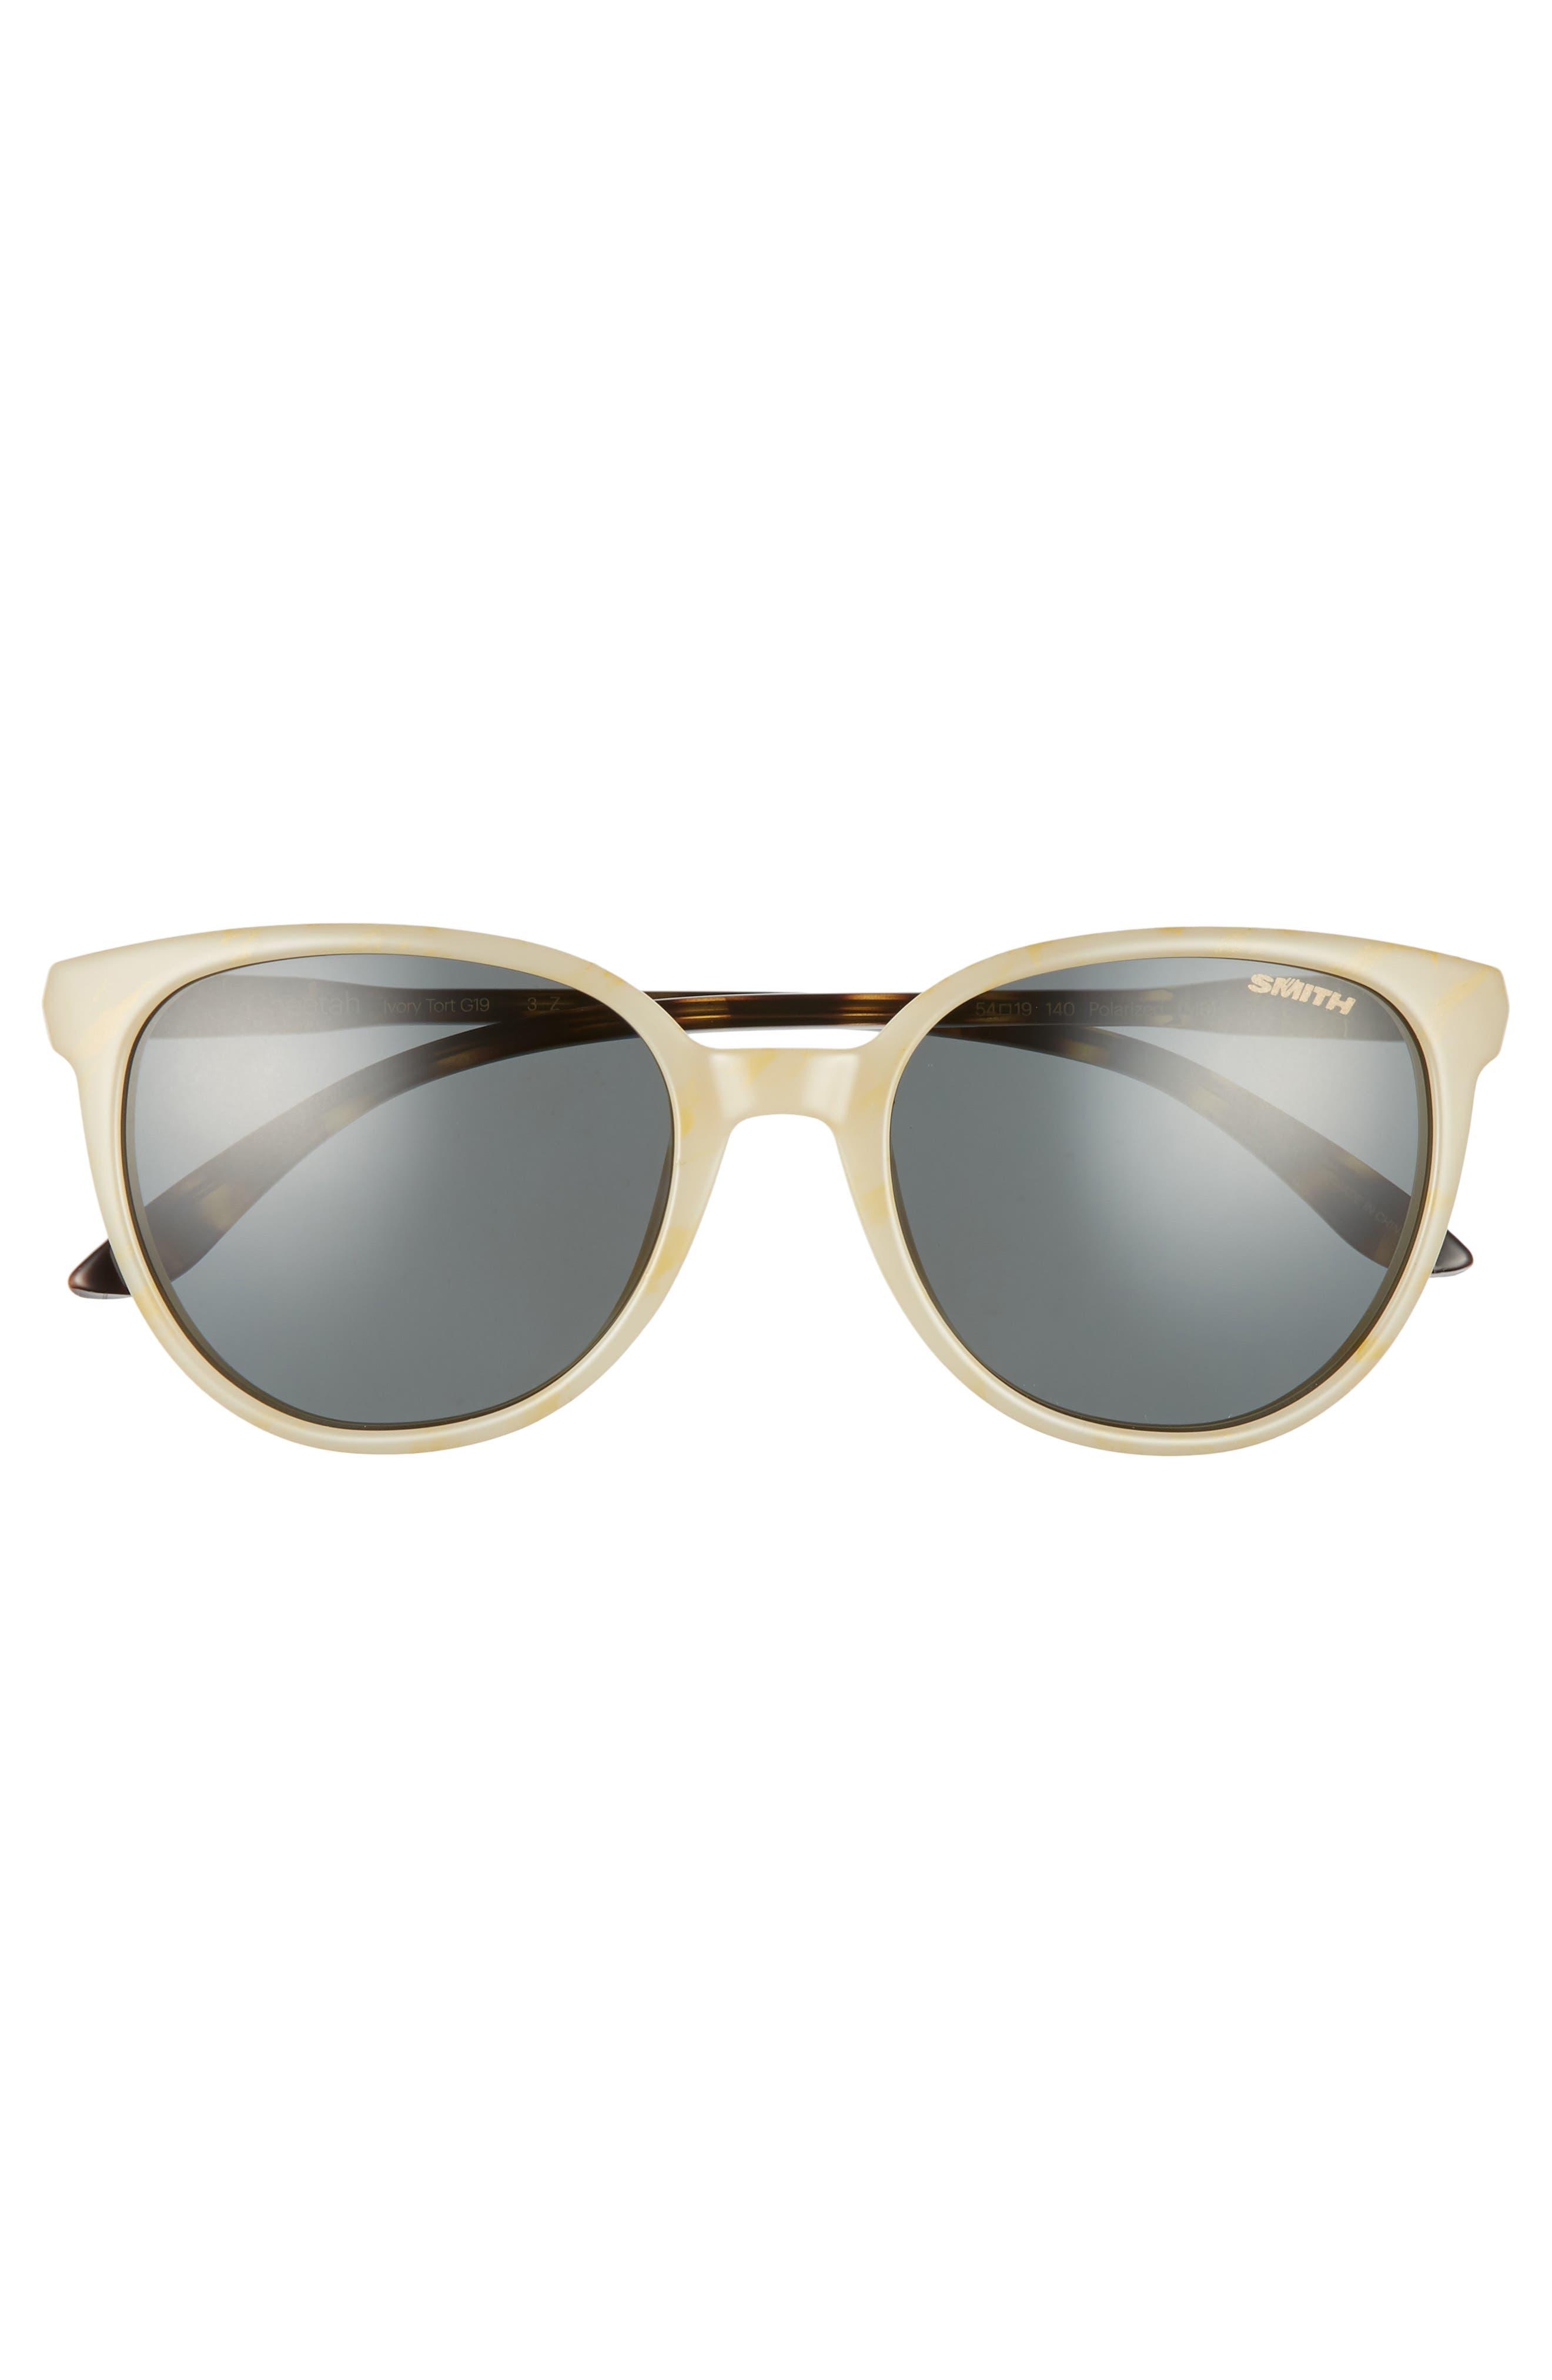 SMITH, Cheetah 54mm ChromaPop<sup>™</sup> Polarized Round Sunglasses, Alternate thumbnail 3, color, IVORY TORTOISE